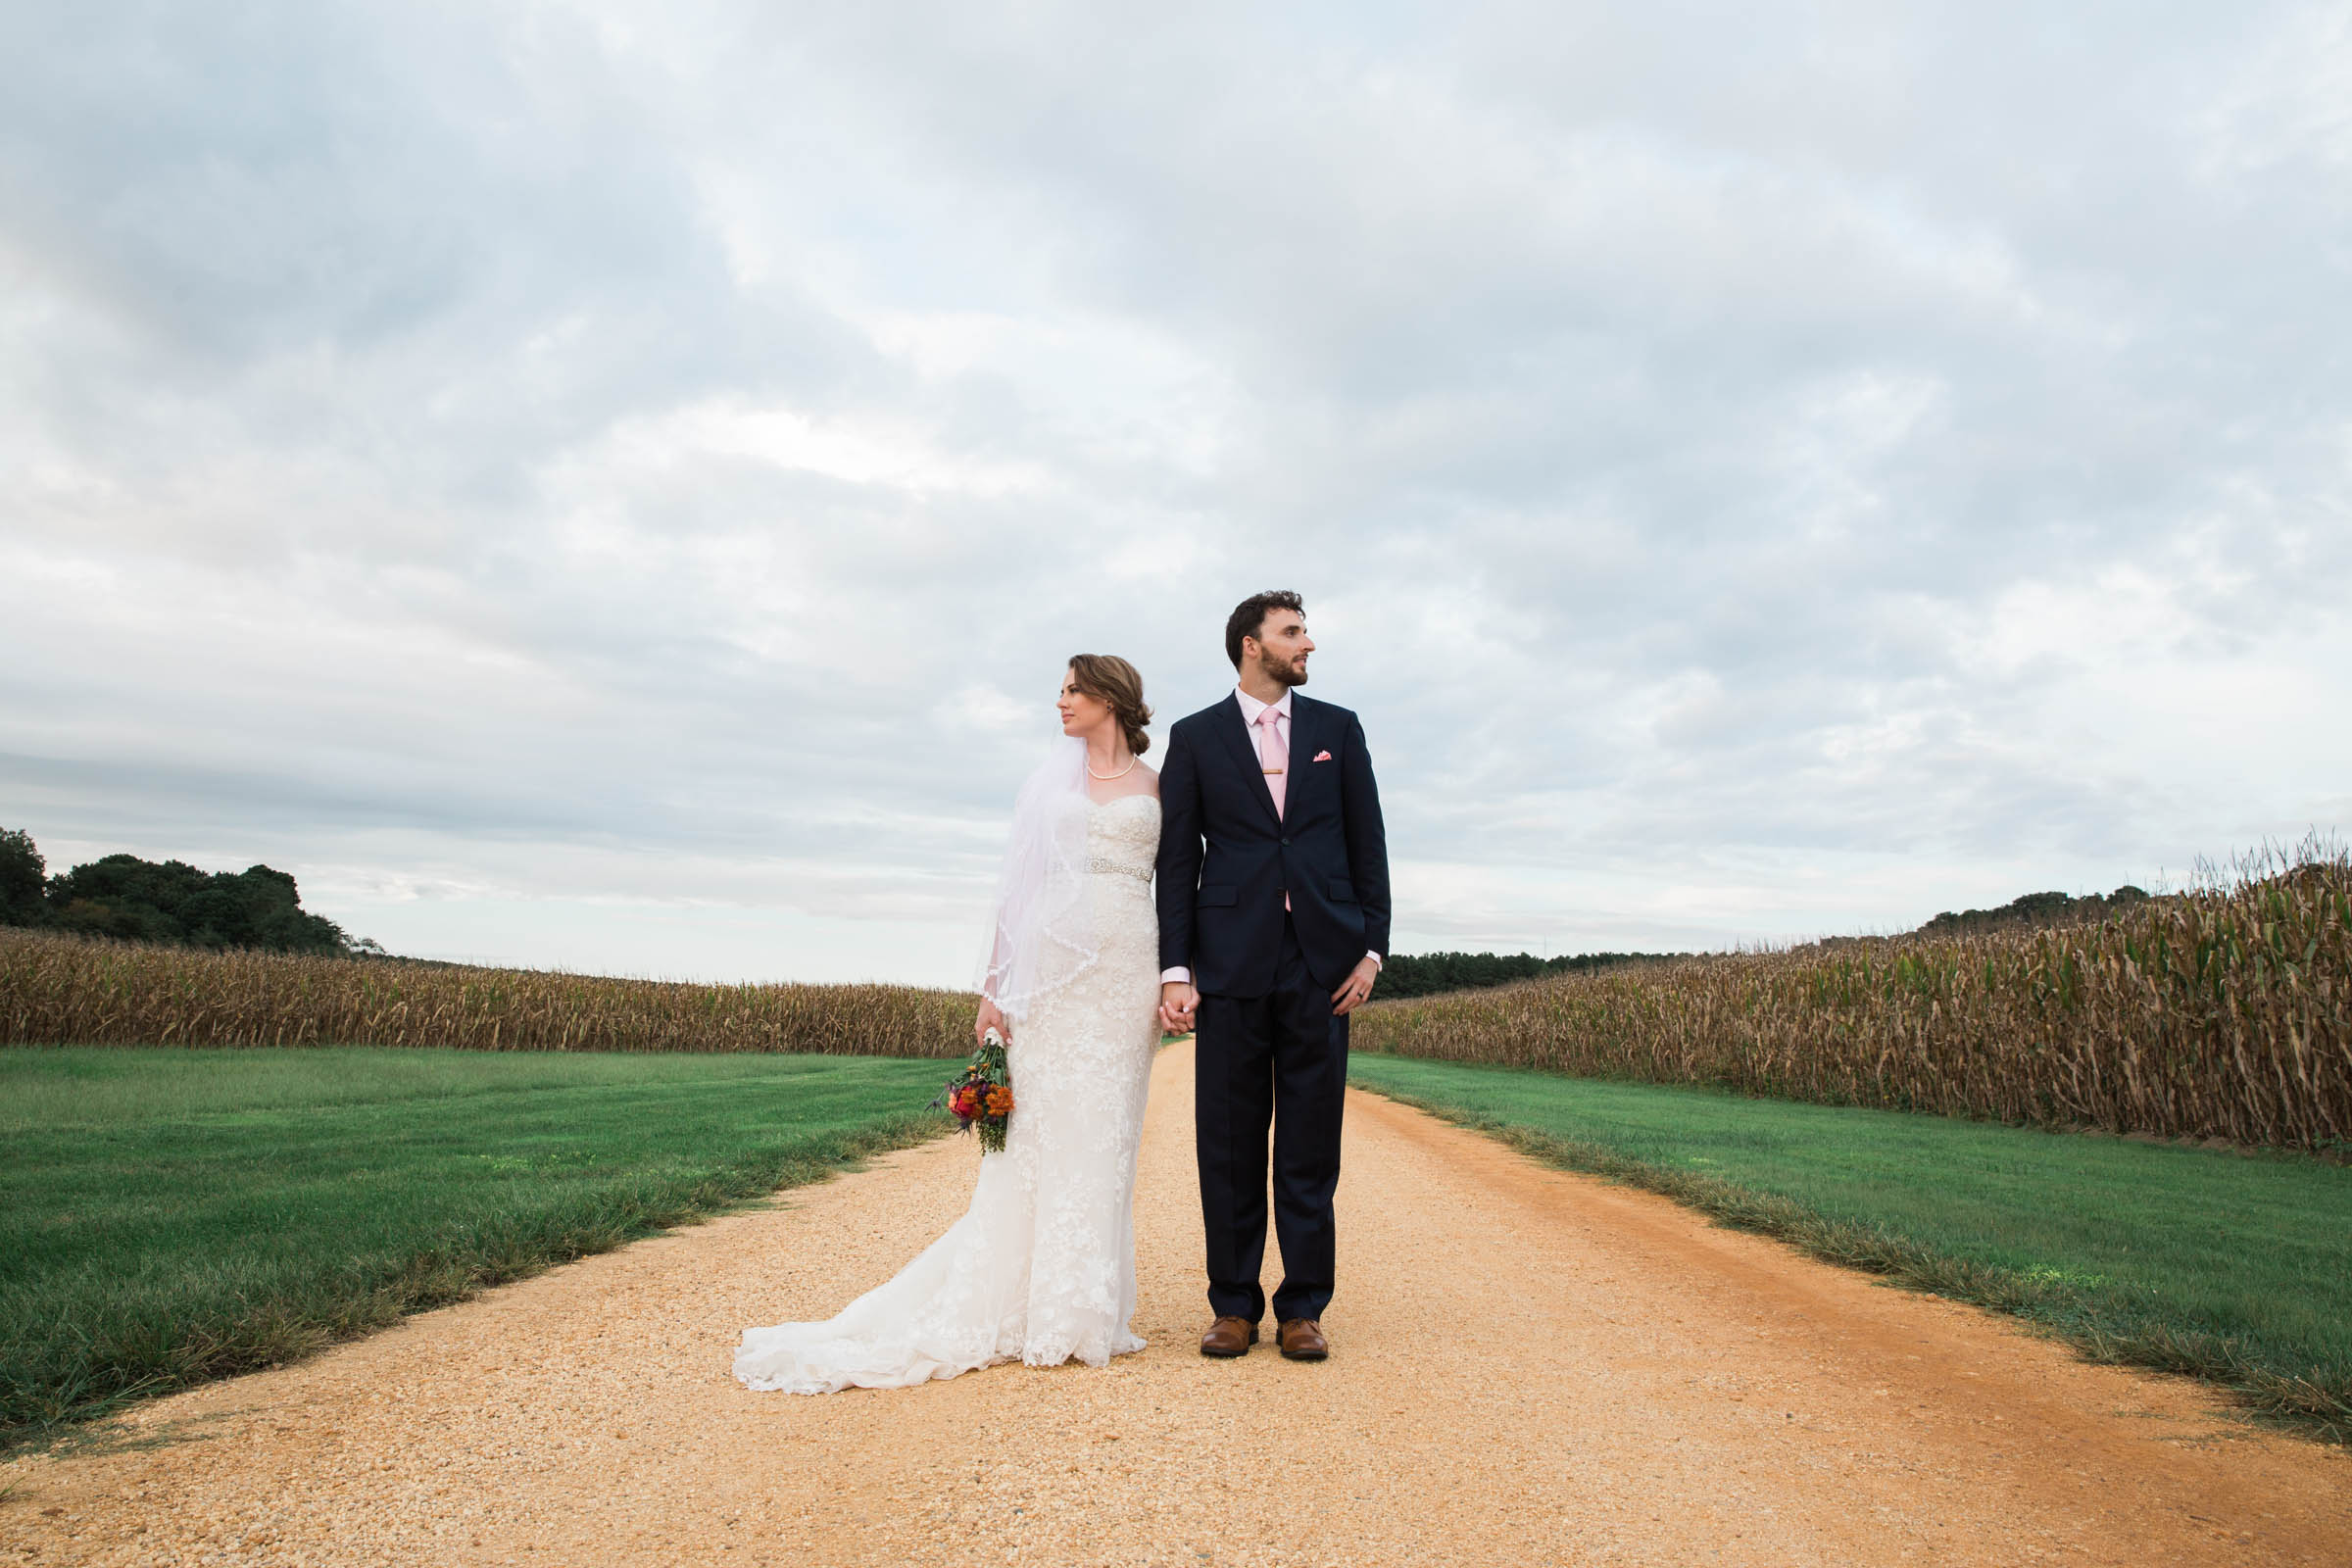 Best Wedding Photographers in Baltimore Maryland Megapixels Media PHOTOGRAPHY (11 of 25).jpg